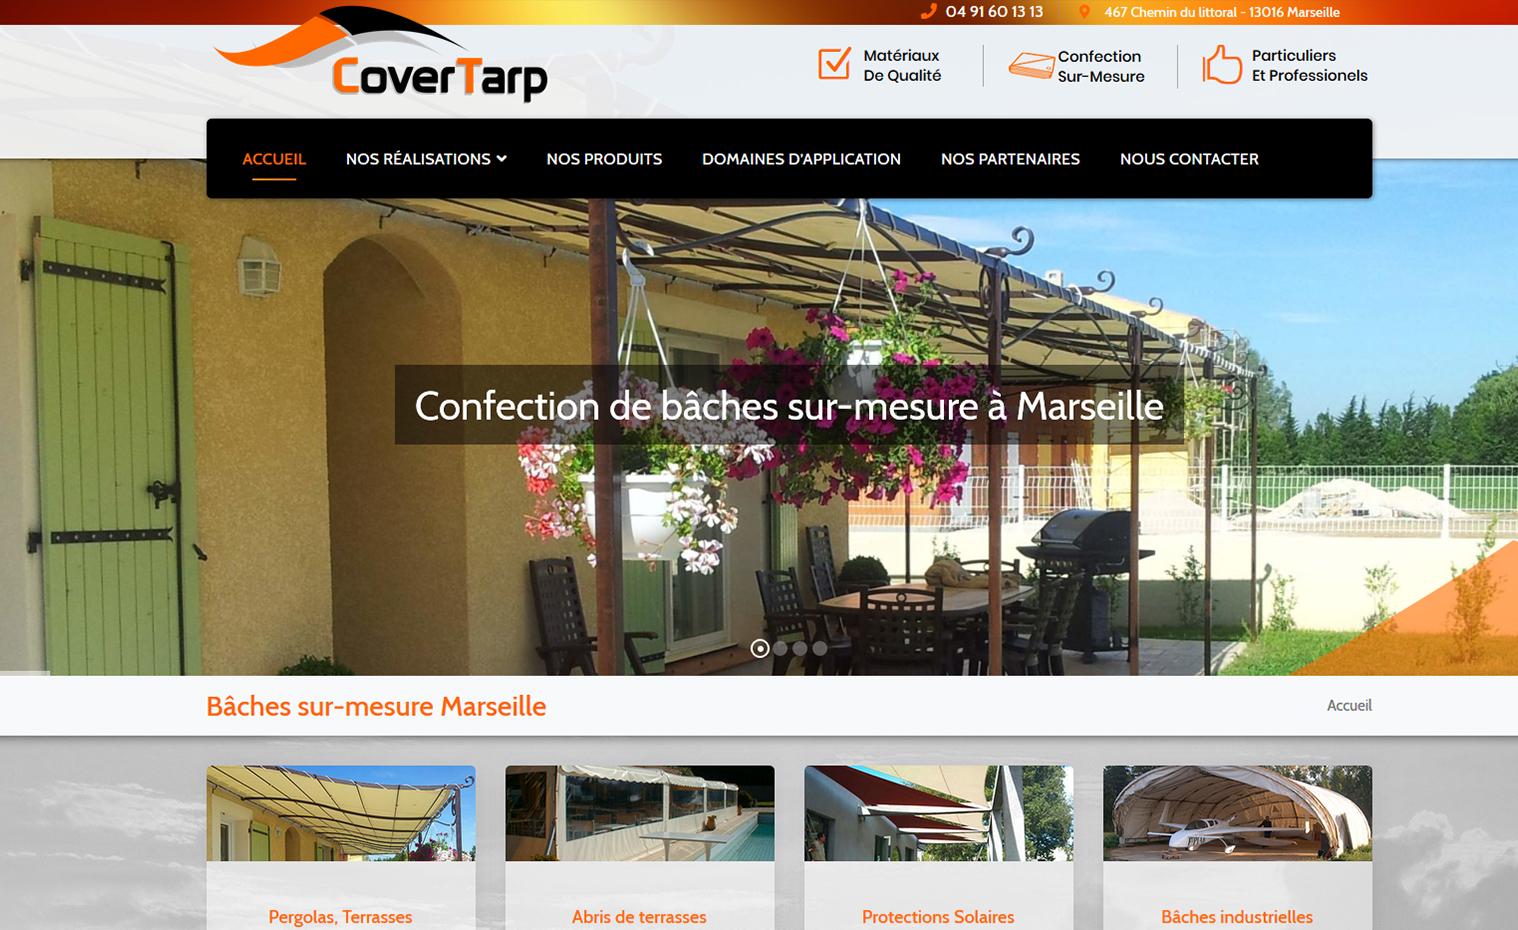 Covertarp